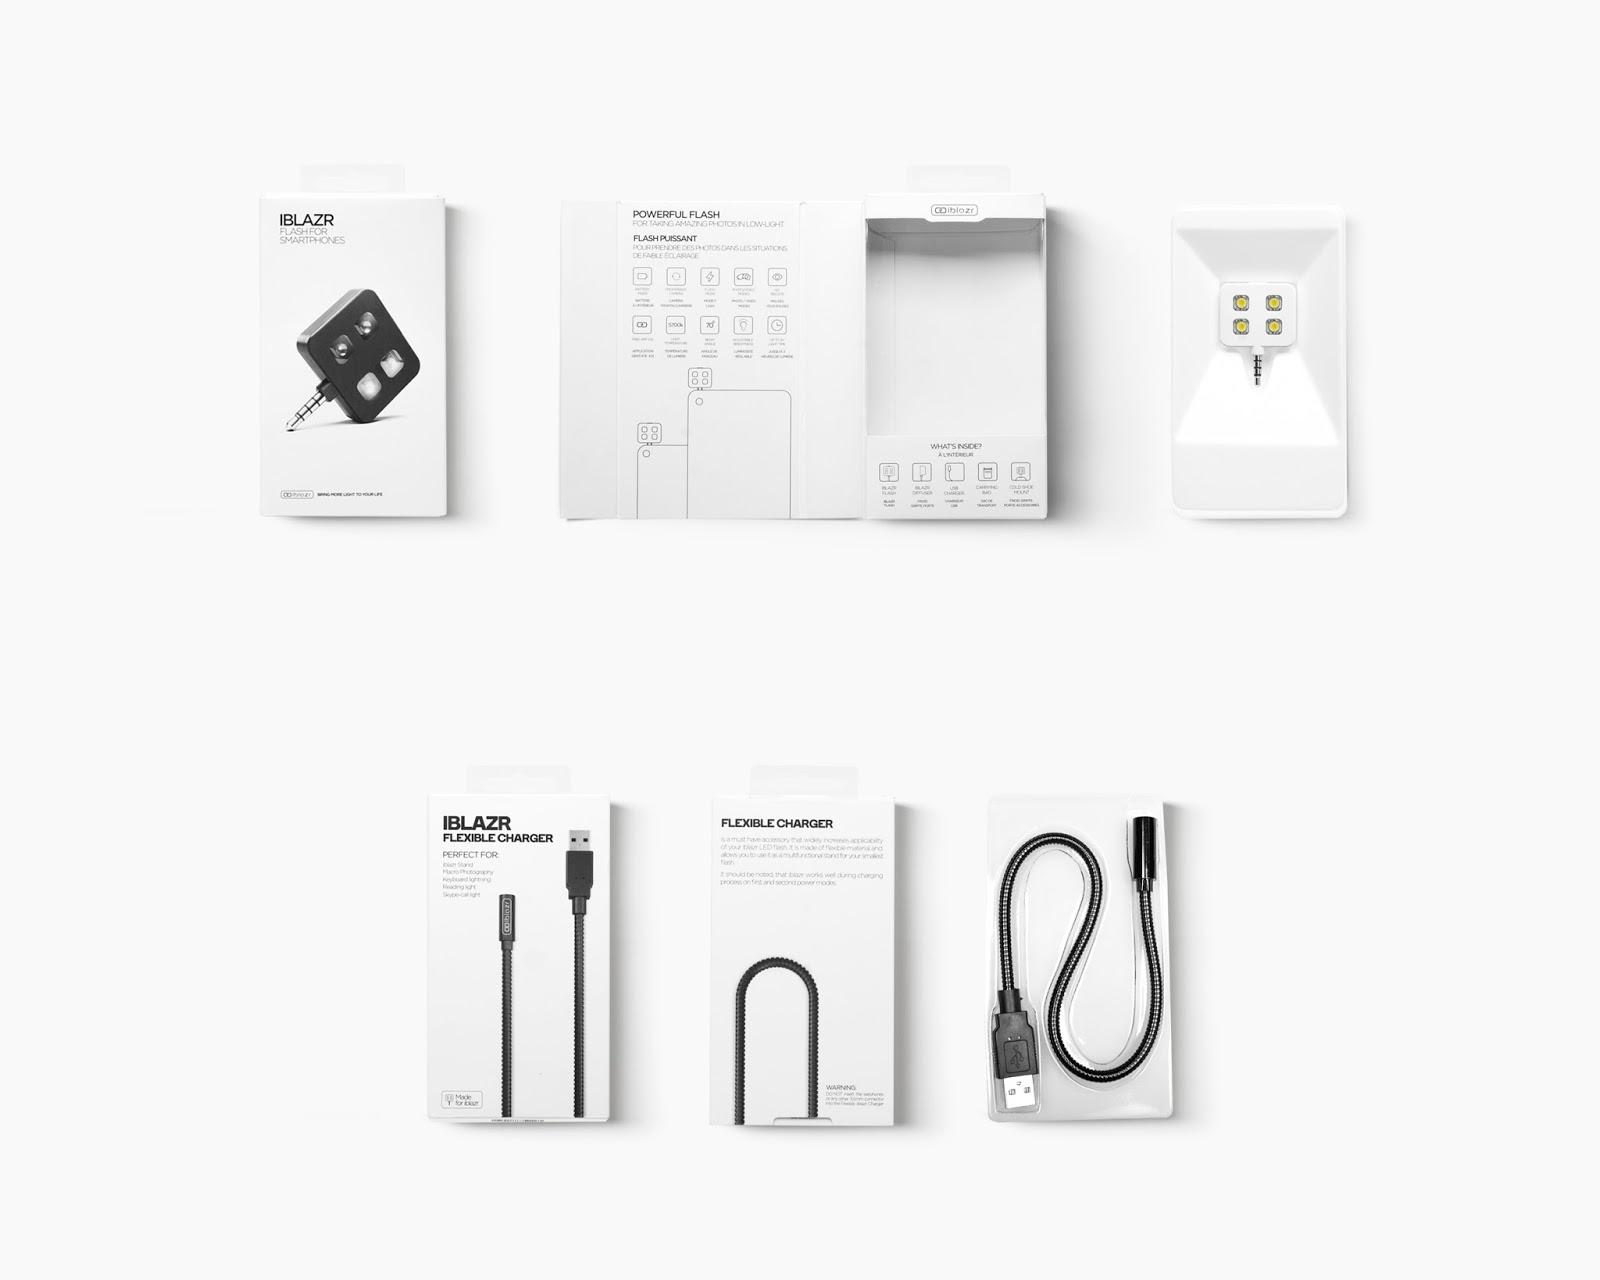 iBlazr 手机线材包装1